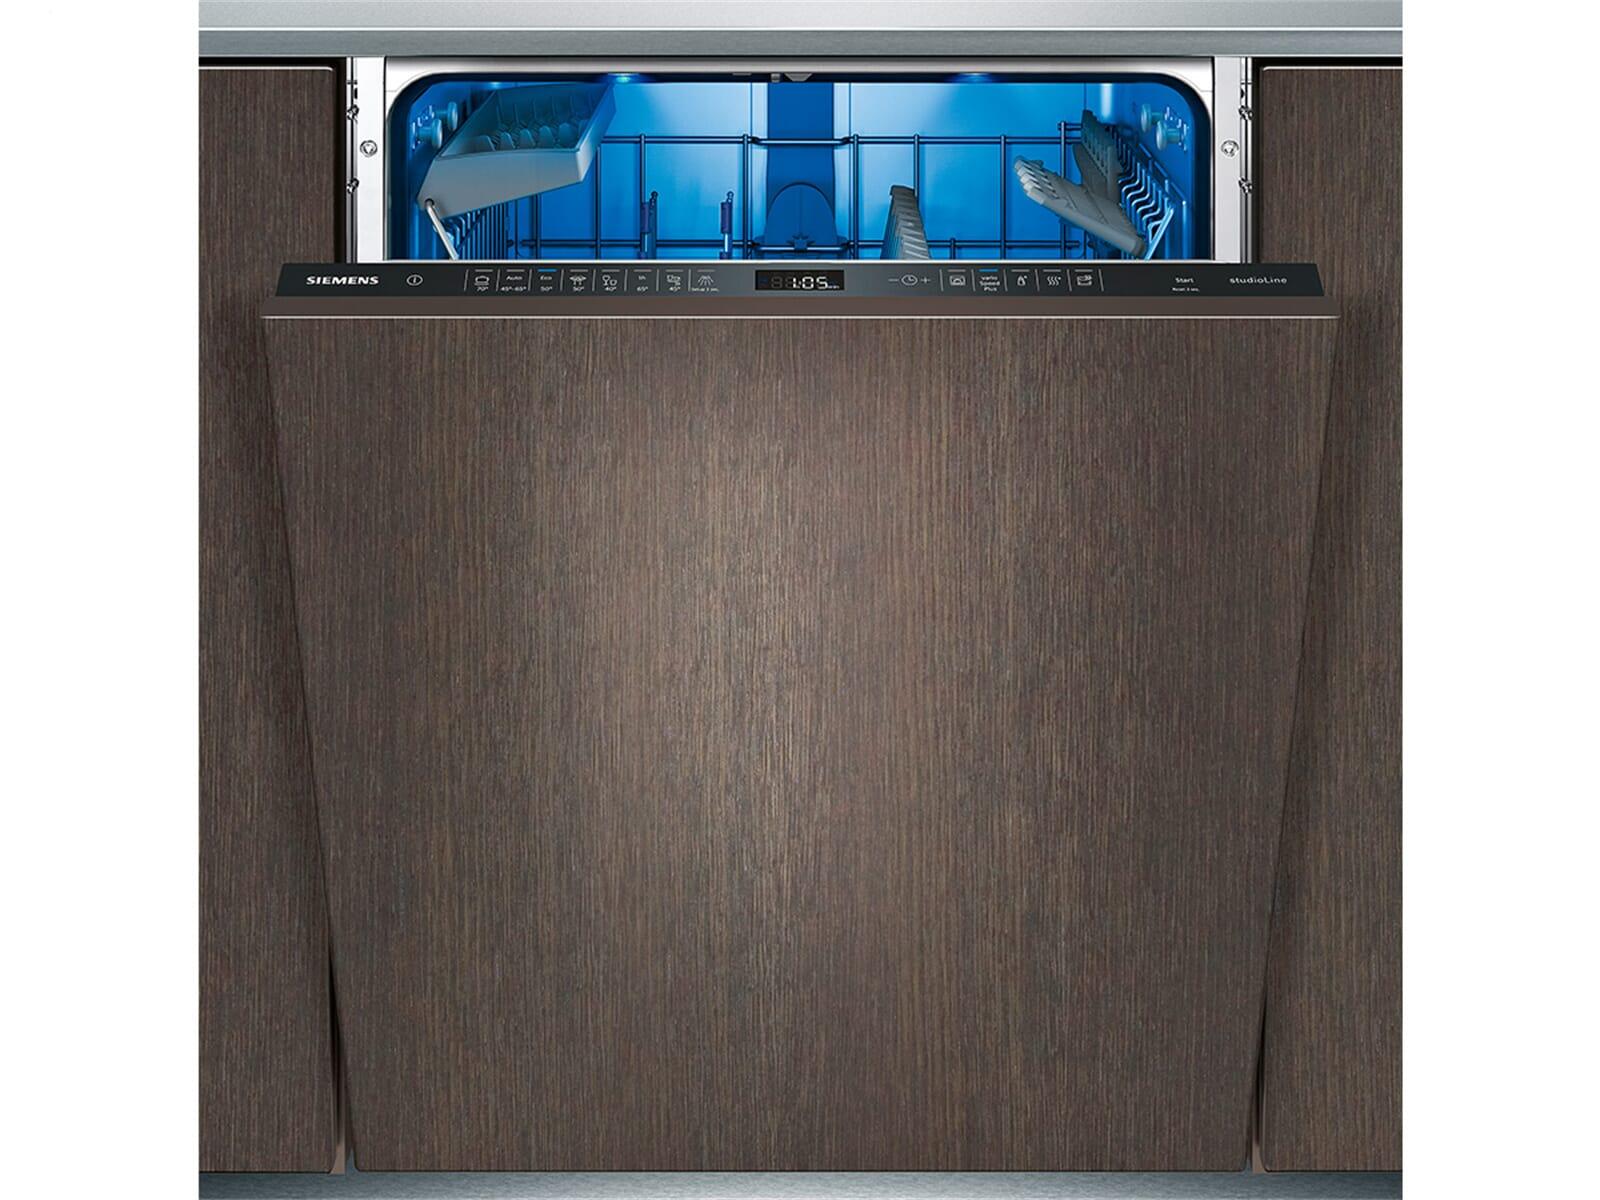 Siemens Kühlschrank Hotline : Siemens studioline sn d pe vollintegrierbarer einbaugeschirrspüler